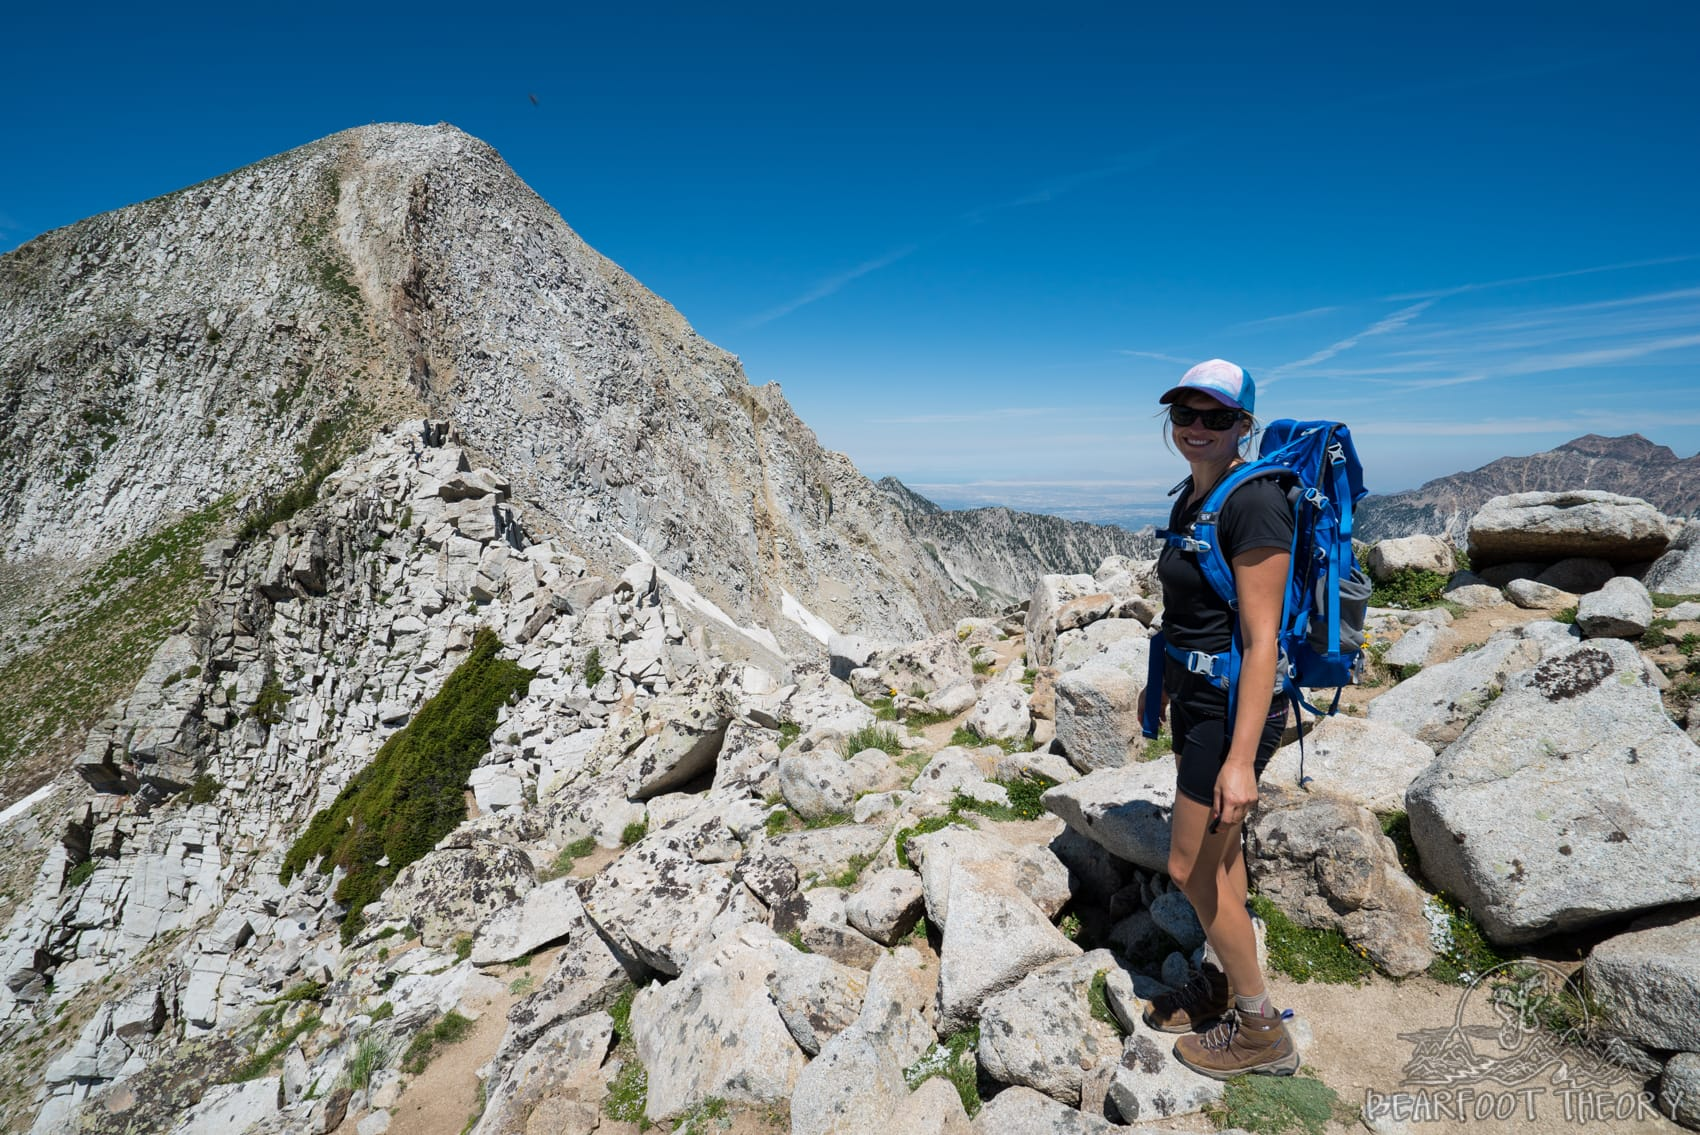 Climbing the Pfeifferhorn, the third tallest peak near Salt Lake City